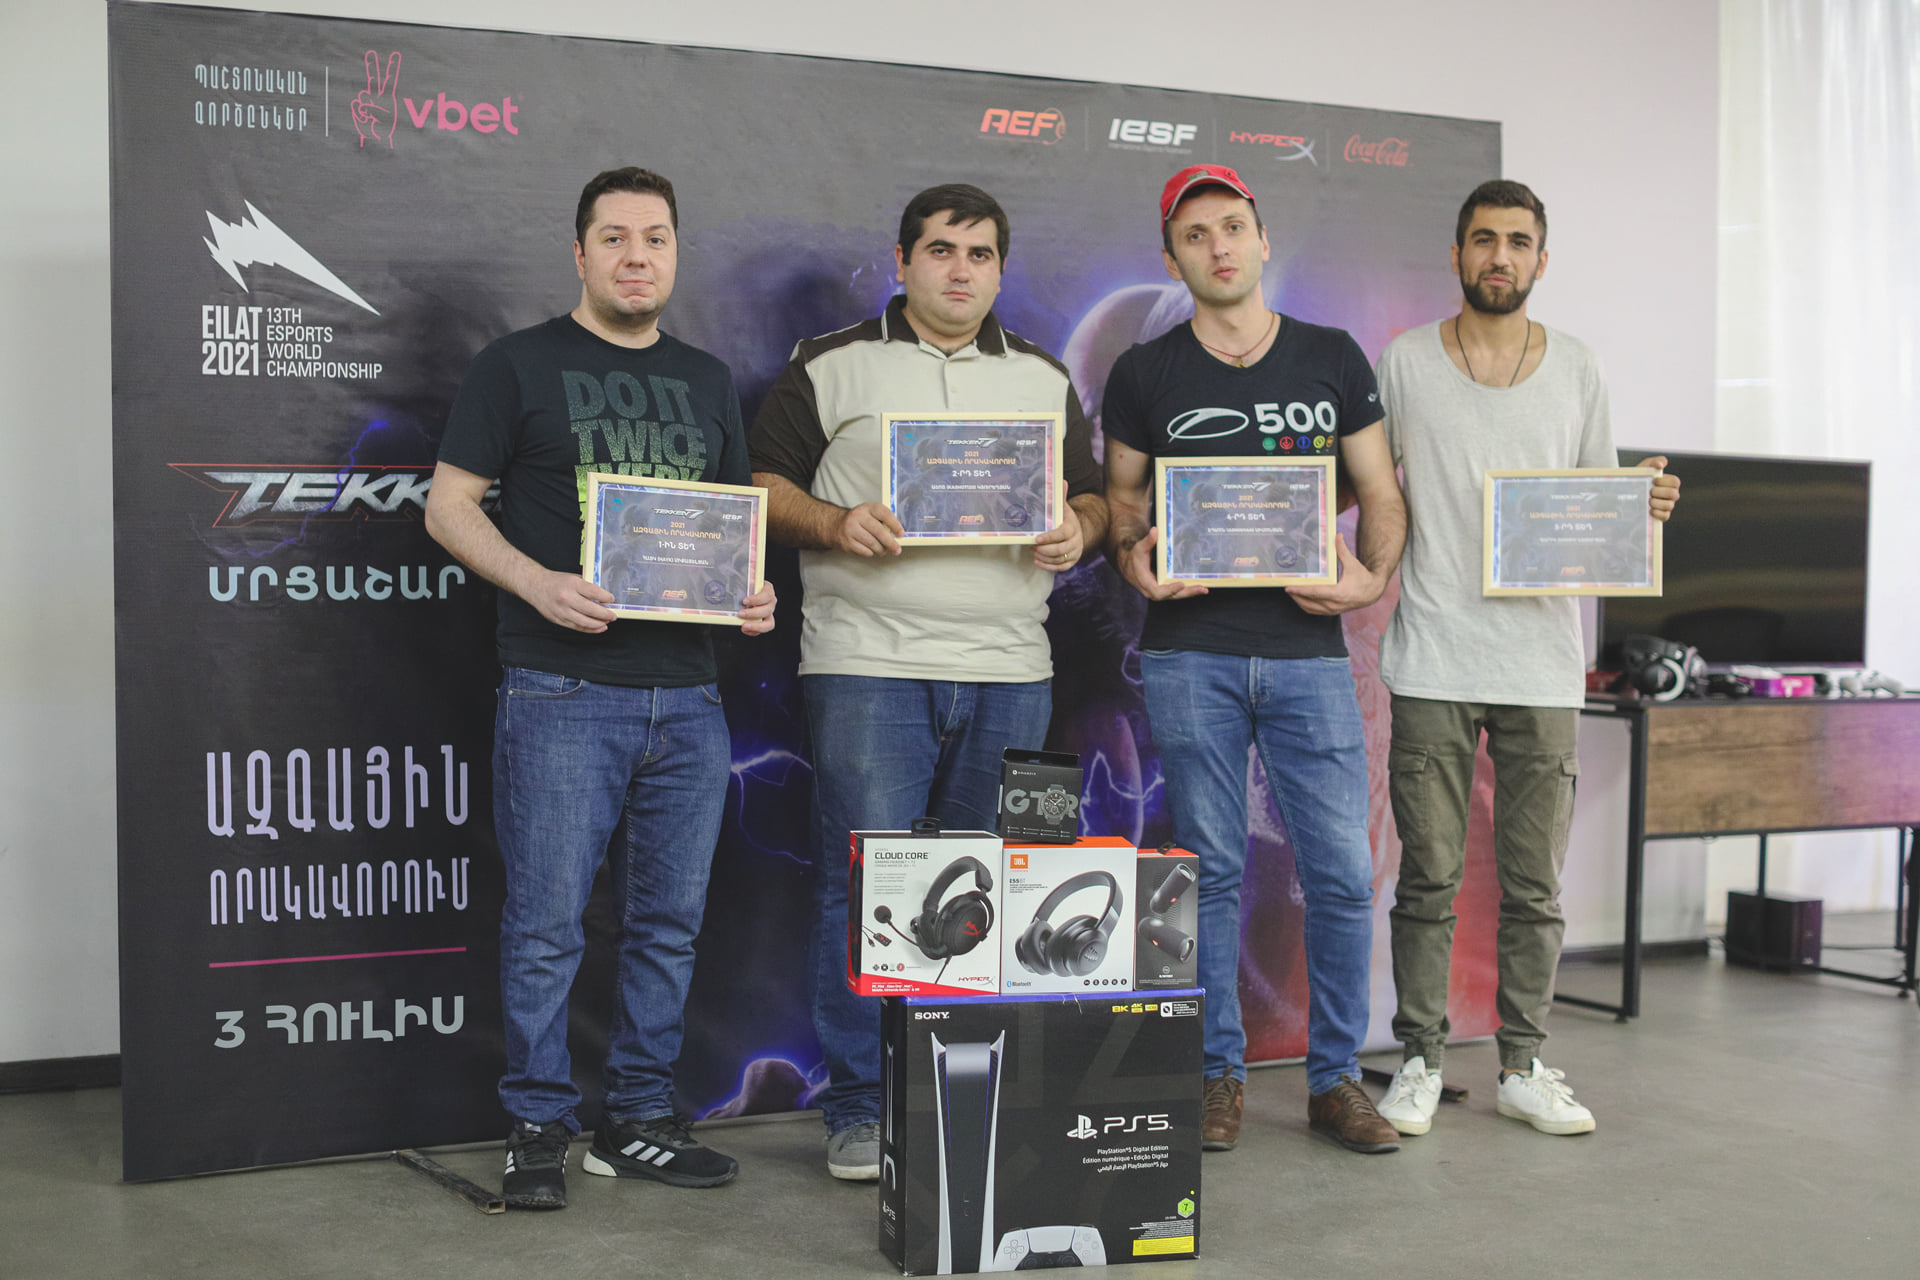 EILAT2021 Tekken 7 national qualifiers was held on July 3